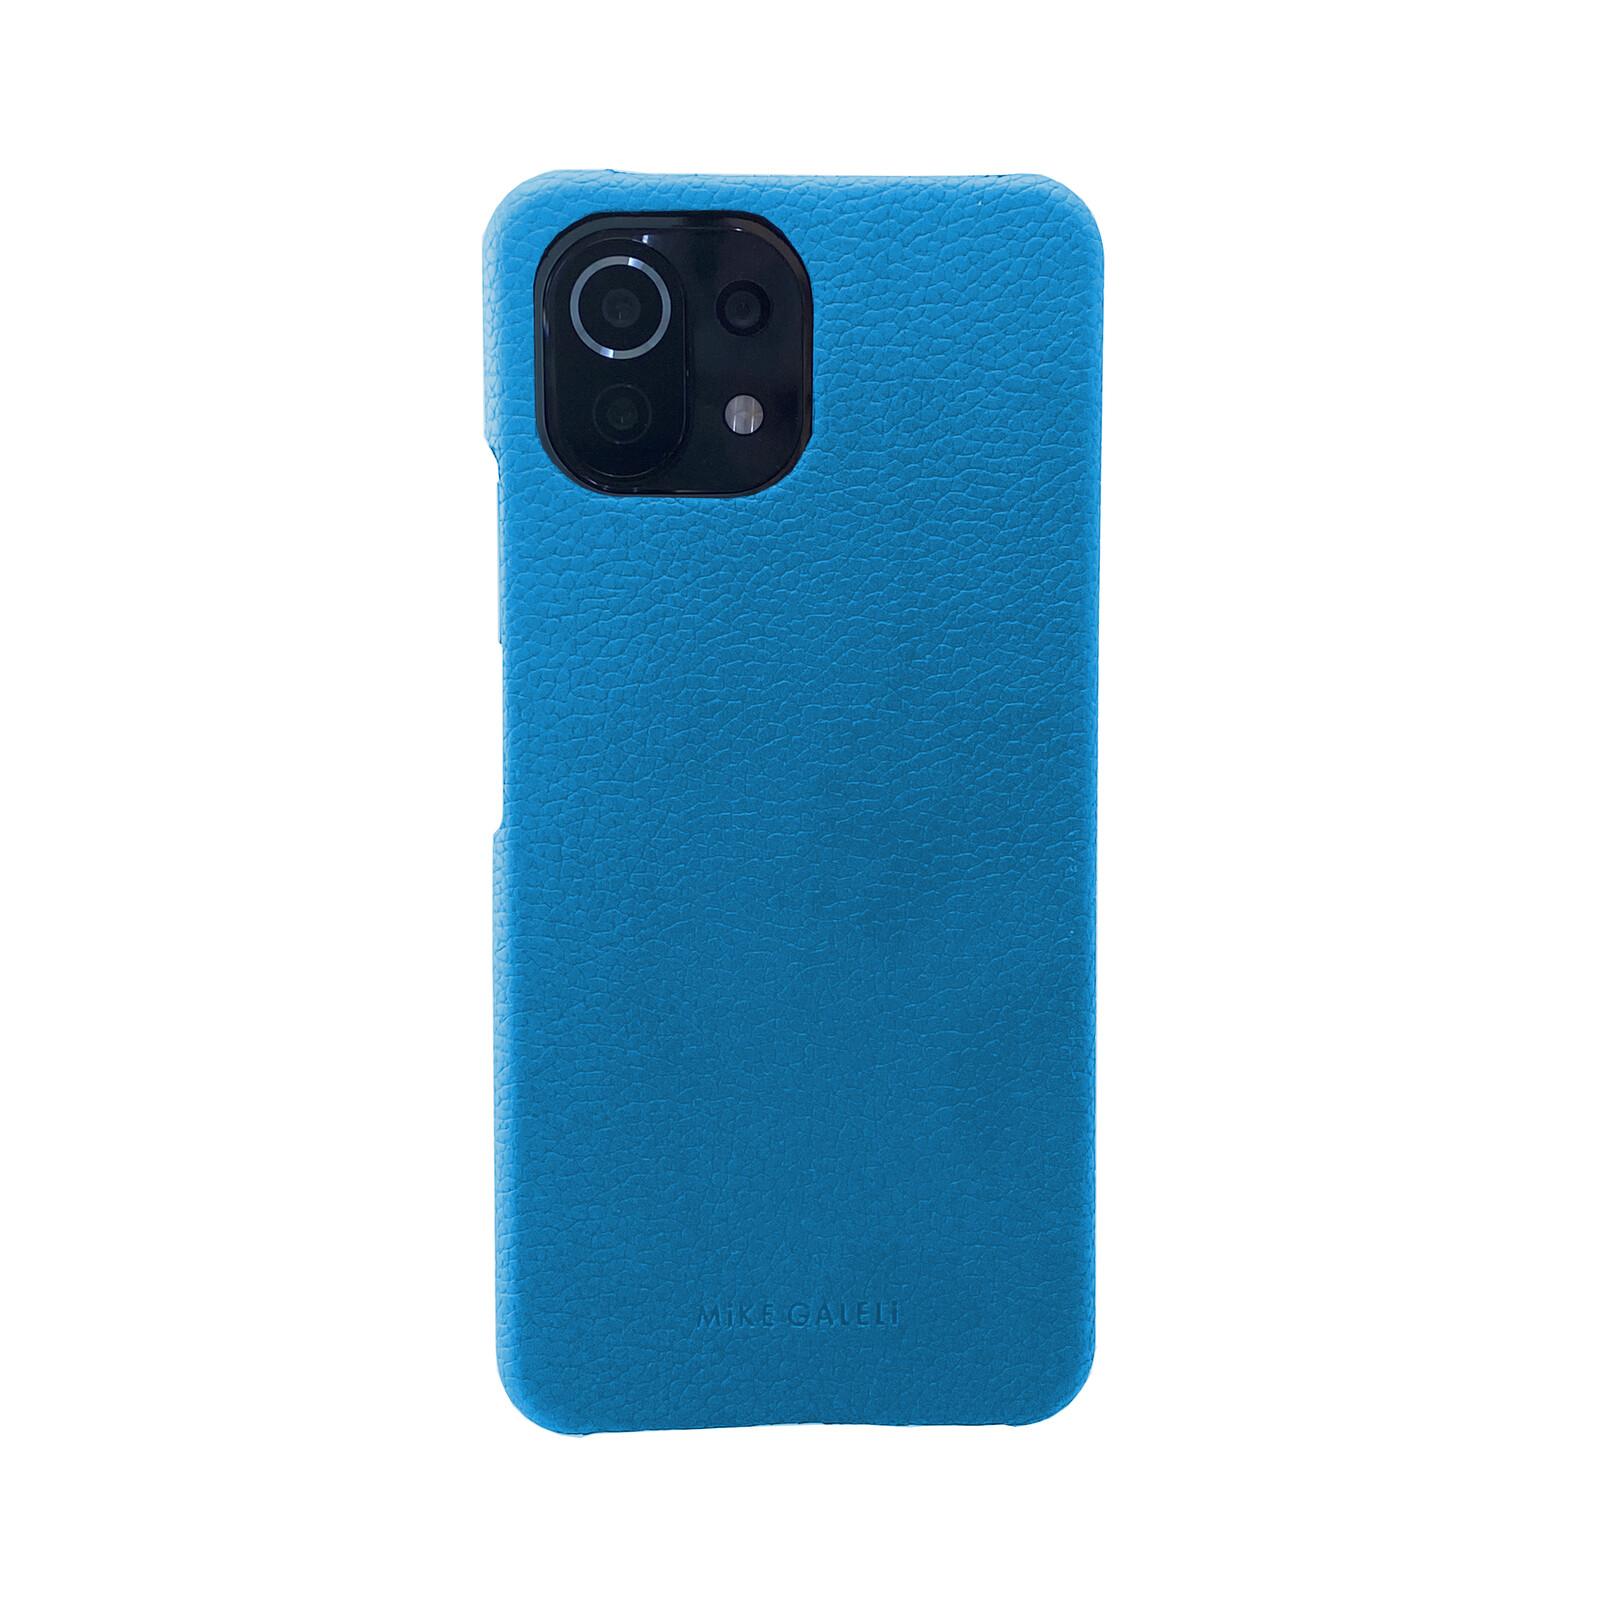 Galeli Back Case Lenny Lite Xiaomi Mi 11 Lite indigo blue